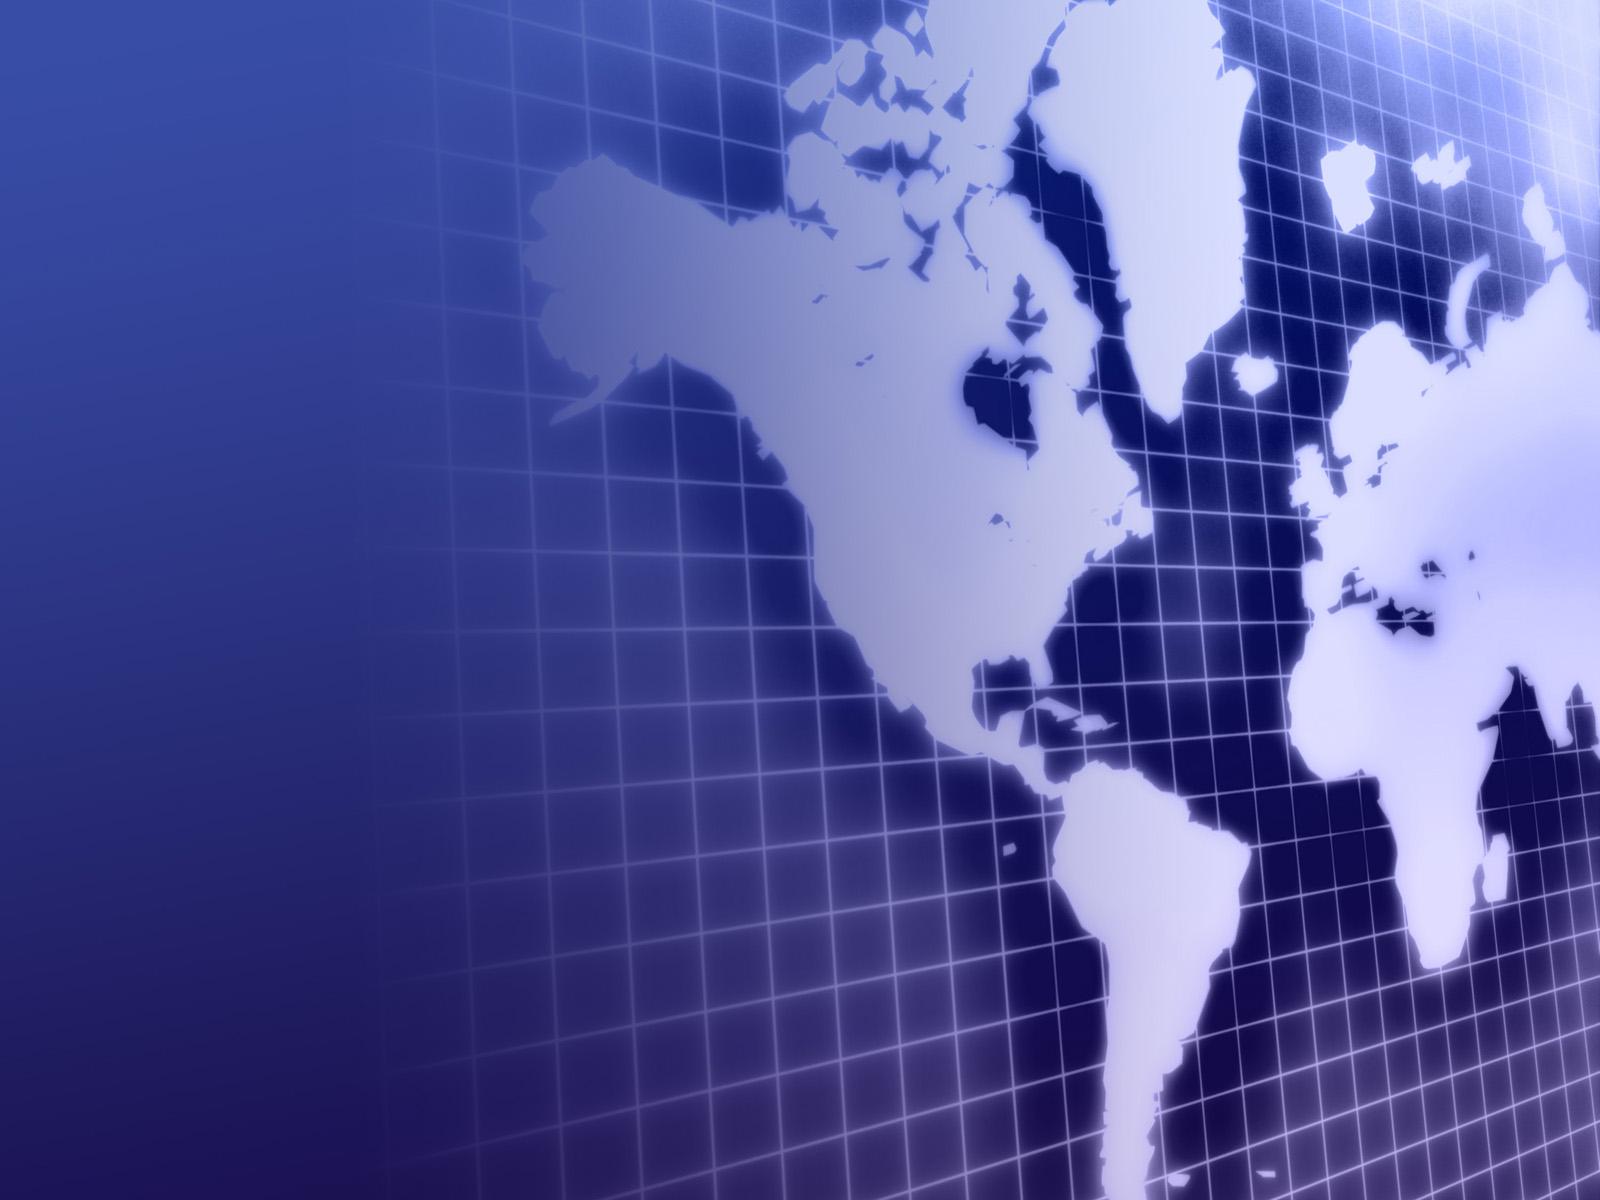 Tech World PPT Backgrounds